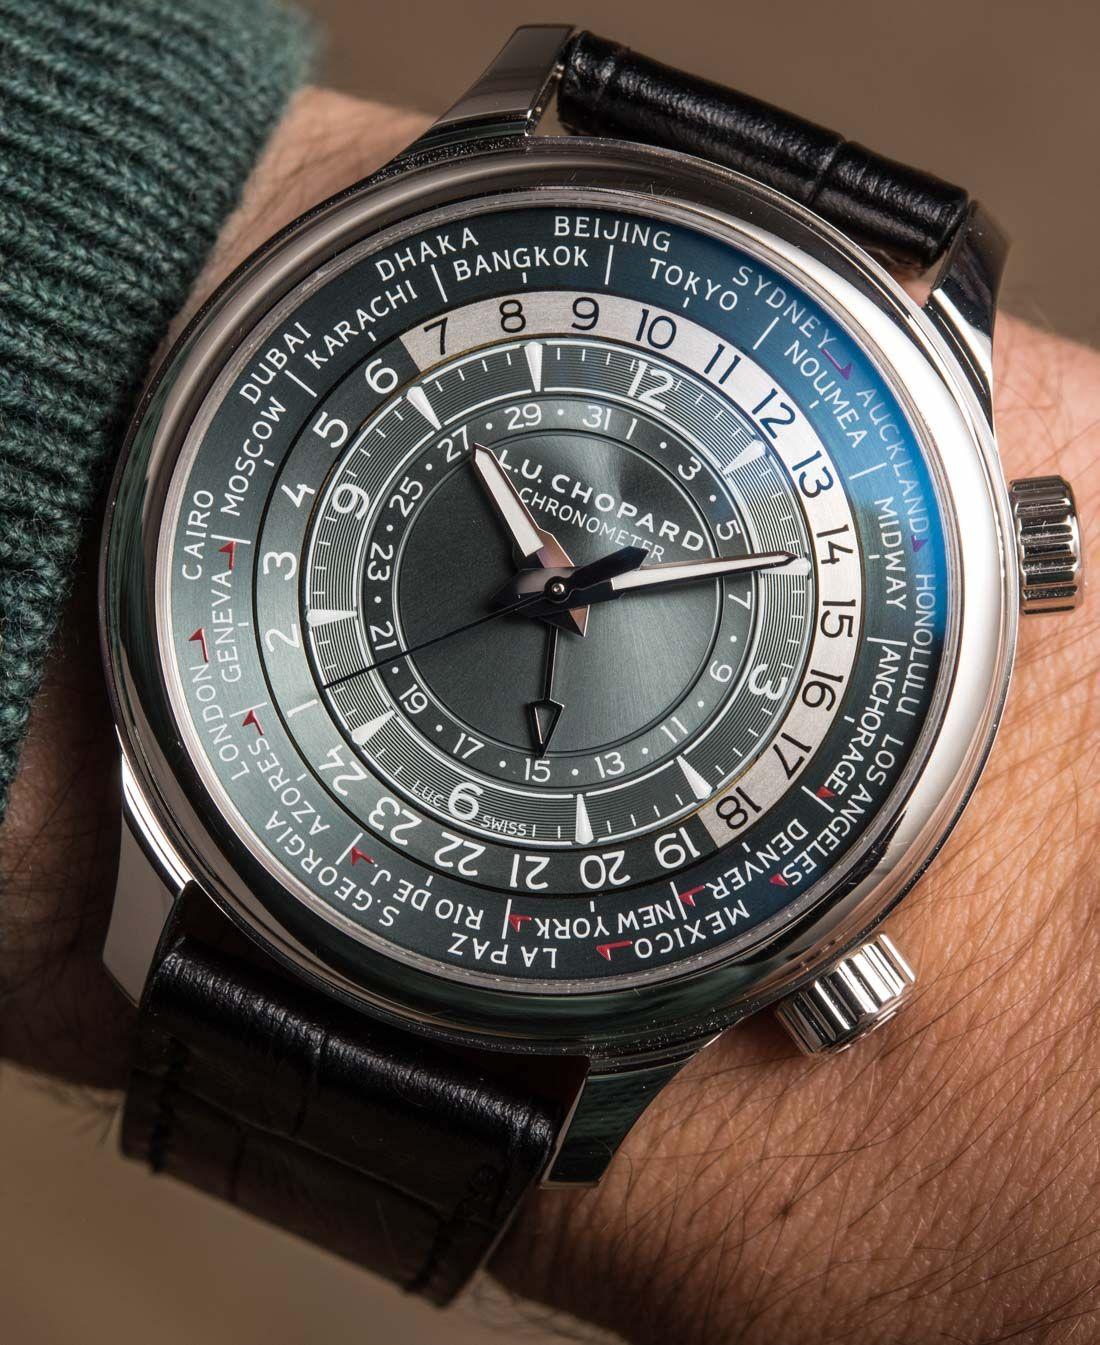 959da352a60 Chopard L.U.C Time Traveler One World Time Watch Hands-On Hands-On ...